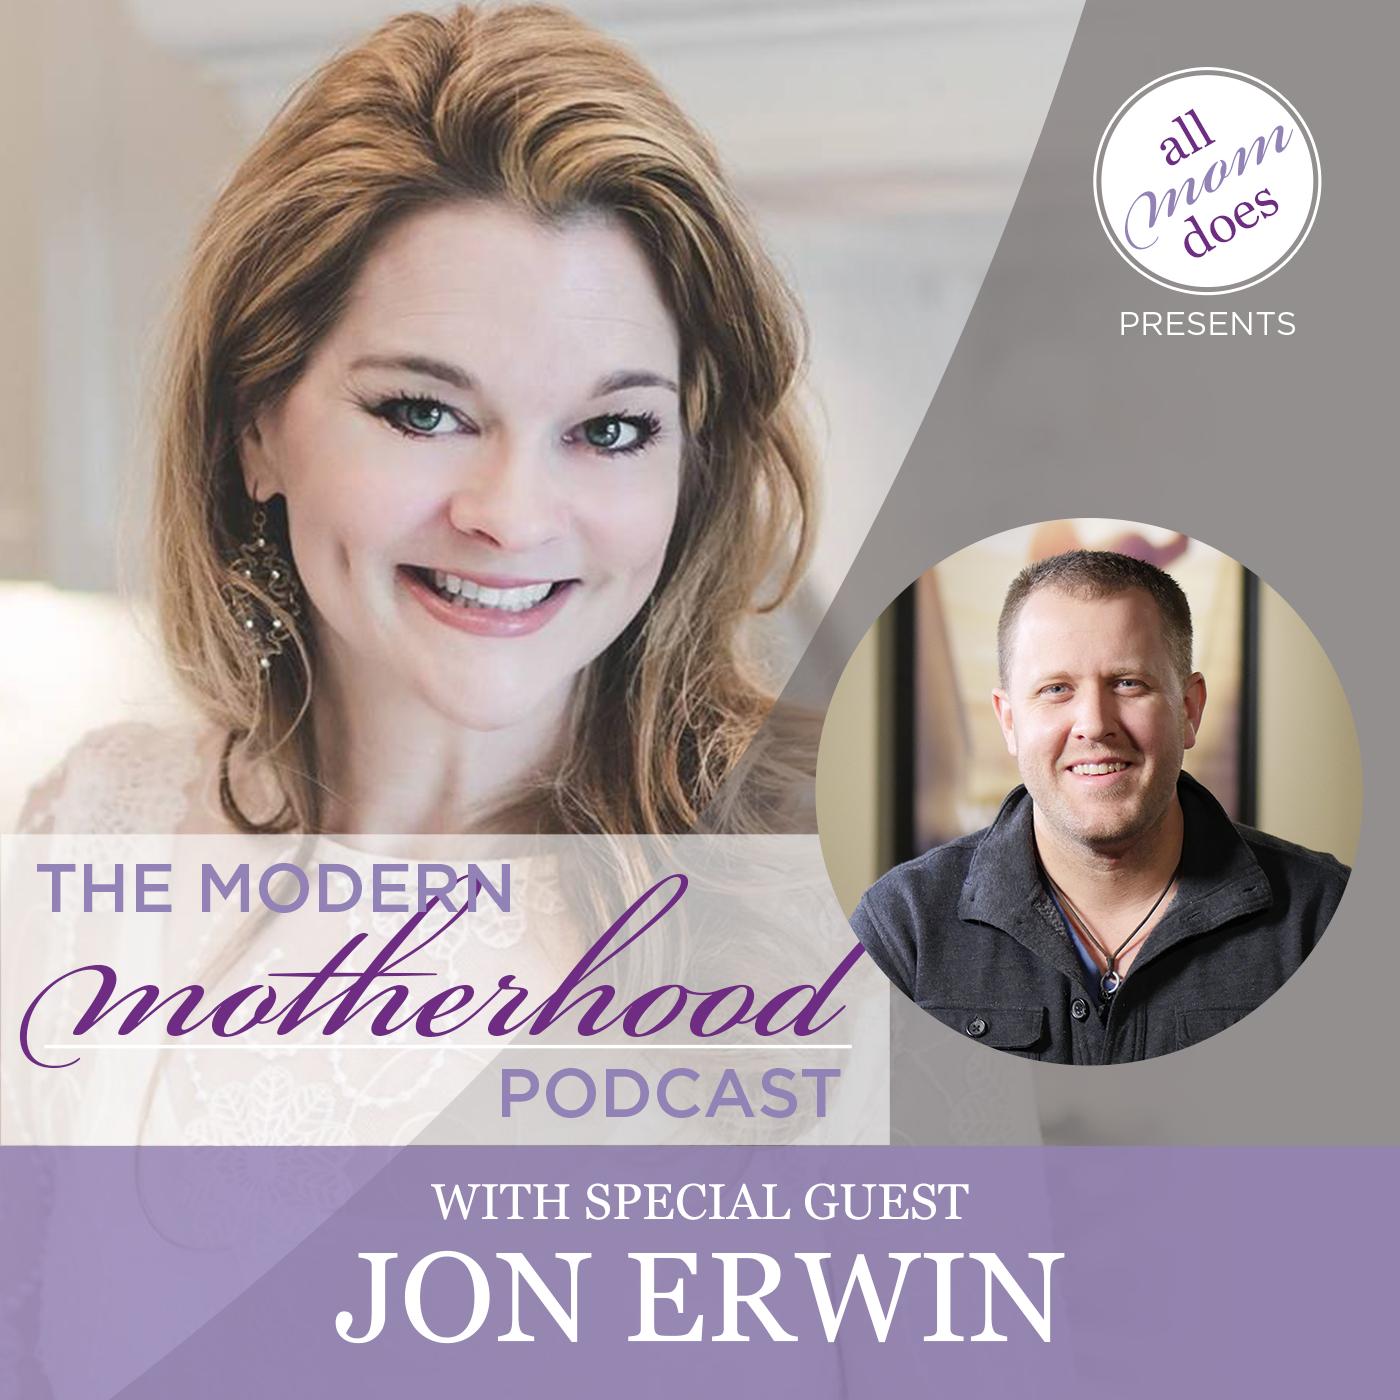 The Modern Motherhood Podcast #9: Jon Erwin